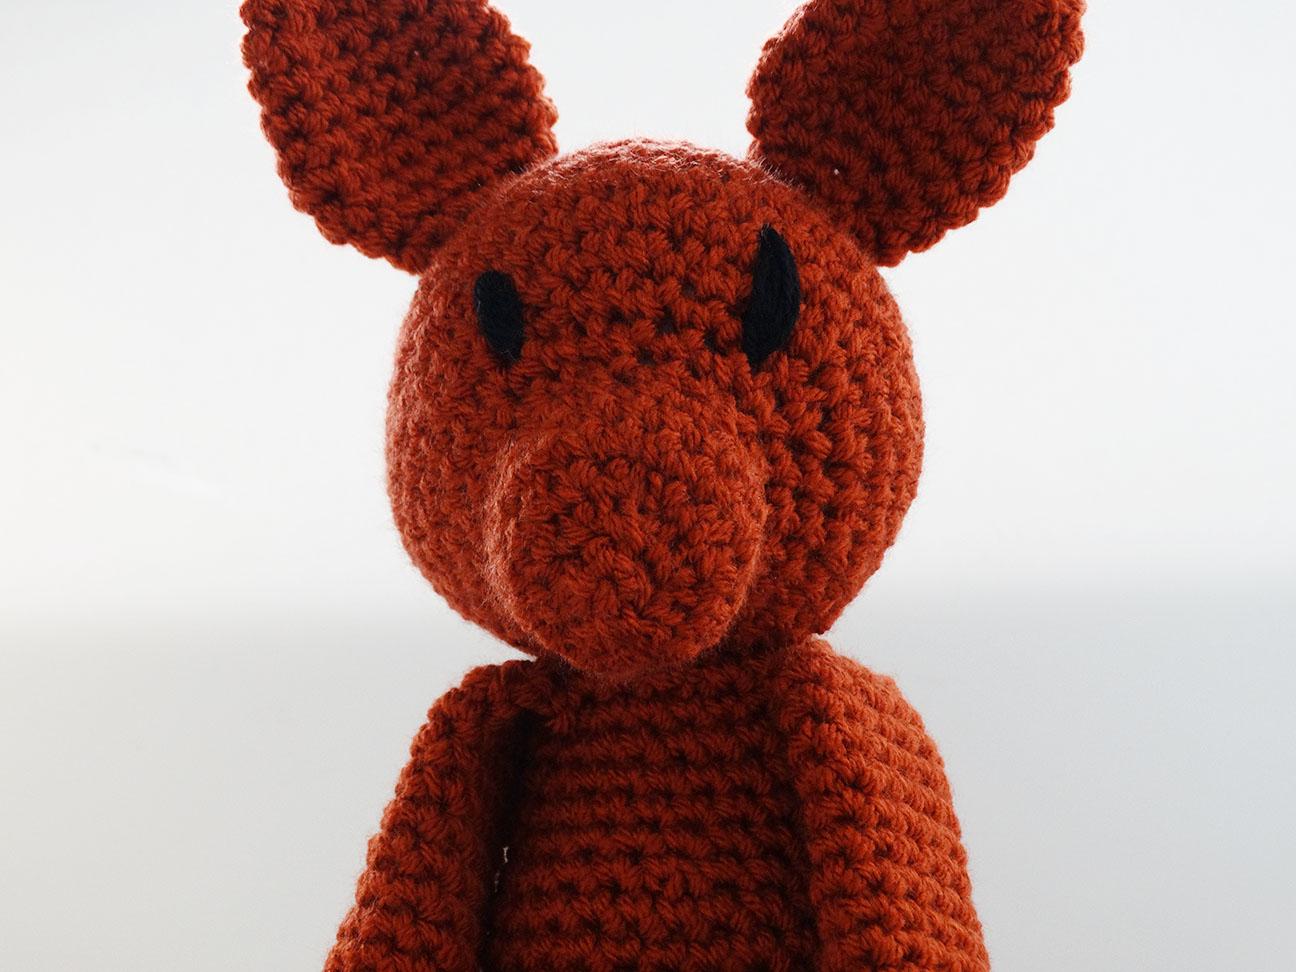 PATTERN: Kangaroo and Baby Crochet Pattern amigurumi | Etsy | 972x1296